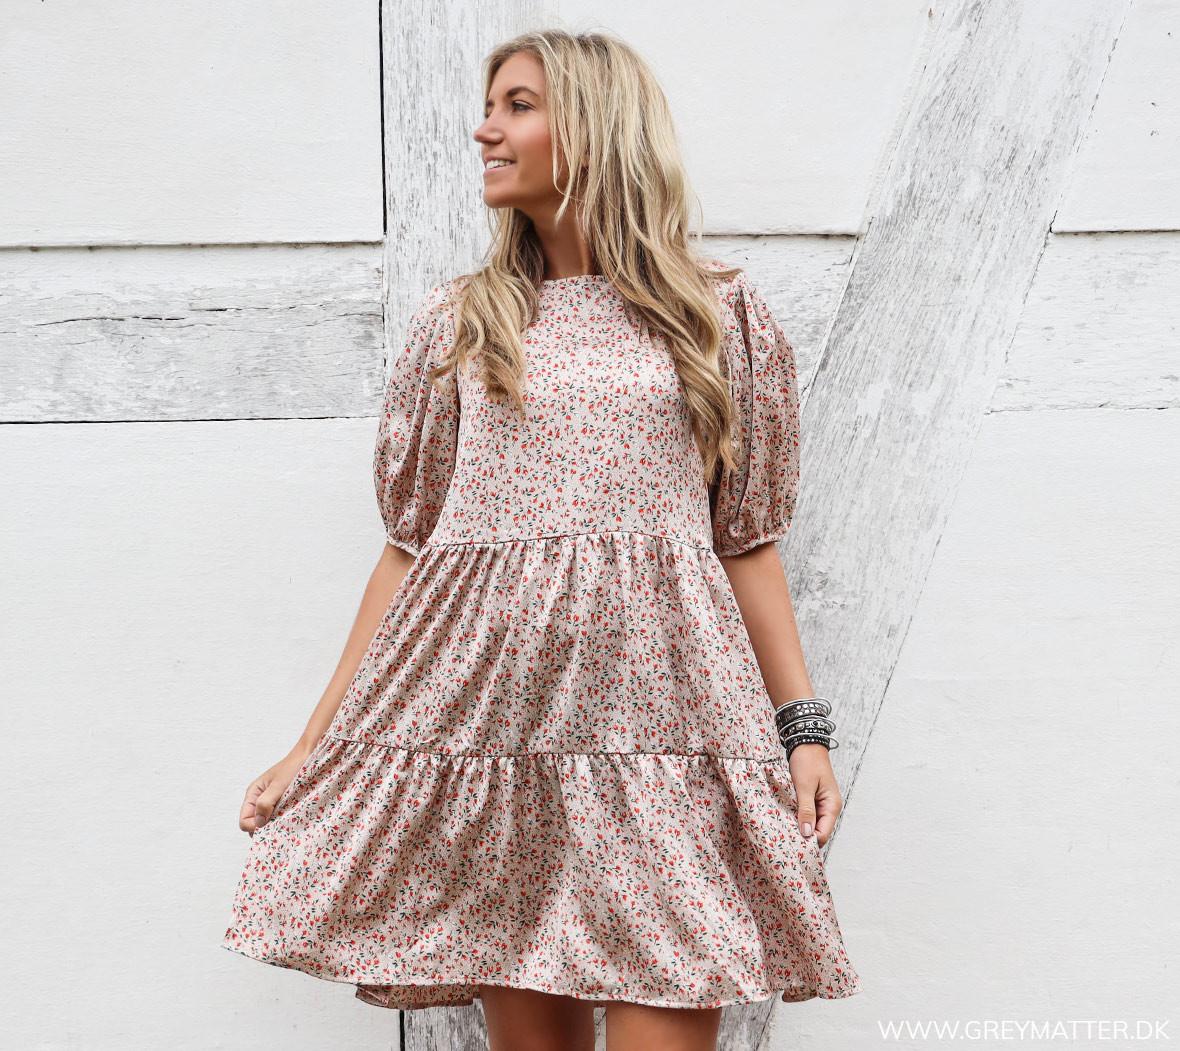 greymatter_fashion_kjoler_med_print.jpg